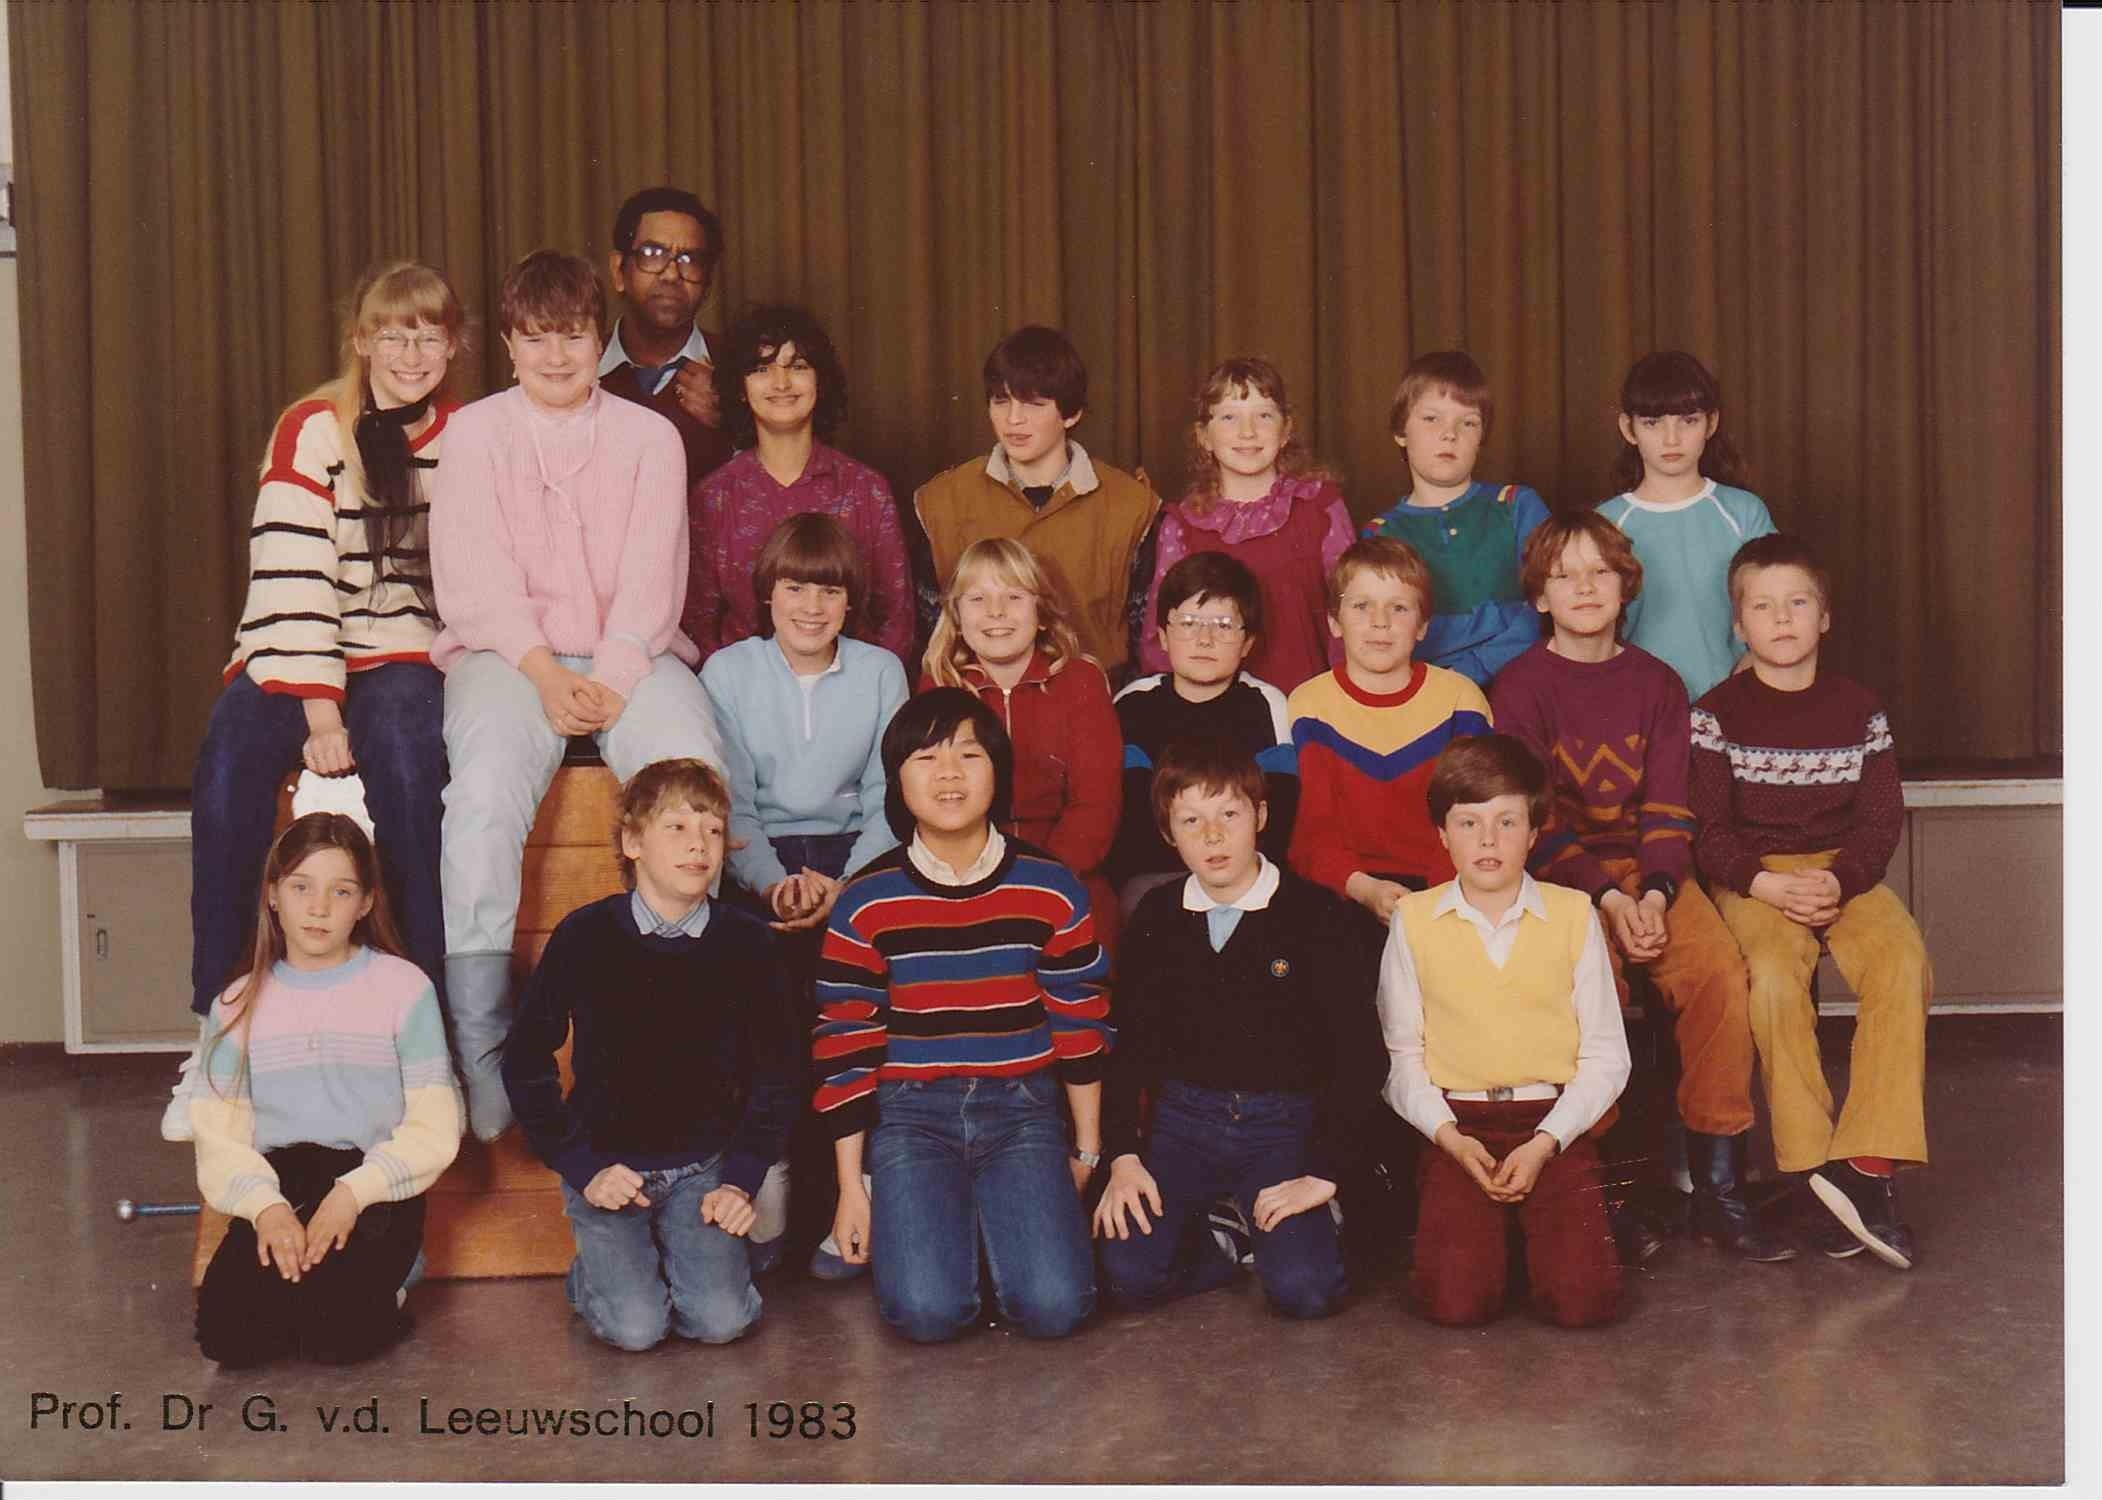 OBS Prof. Dr. G. v.d. Leeuwschool foto